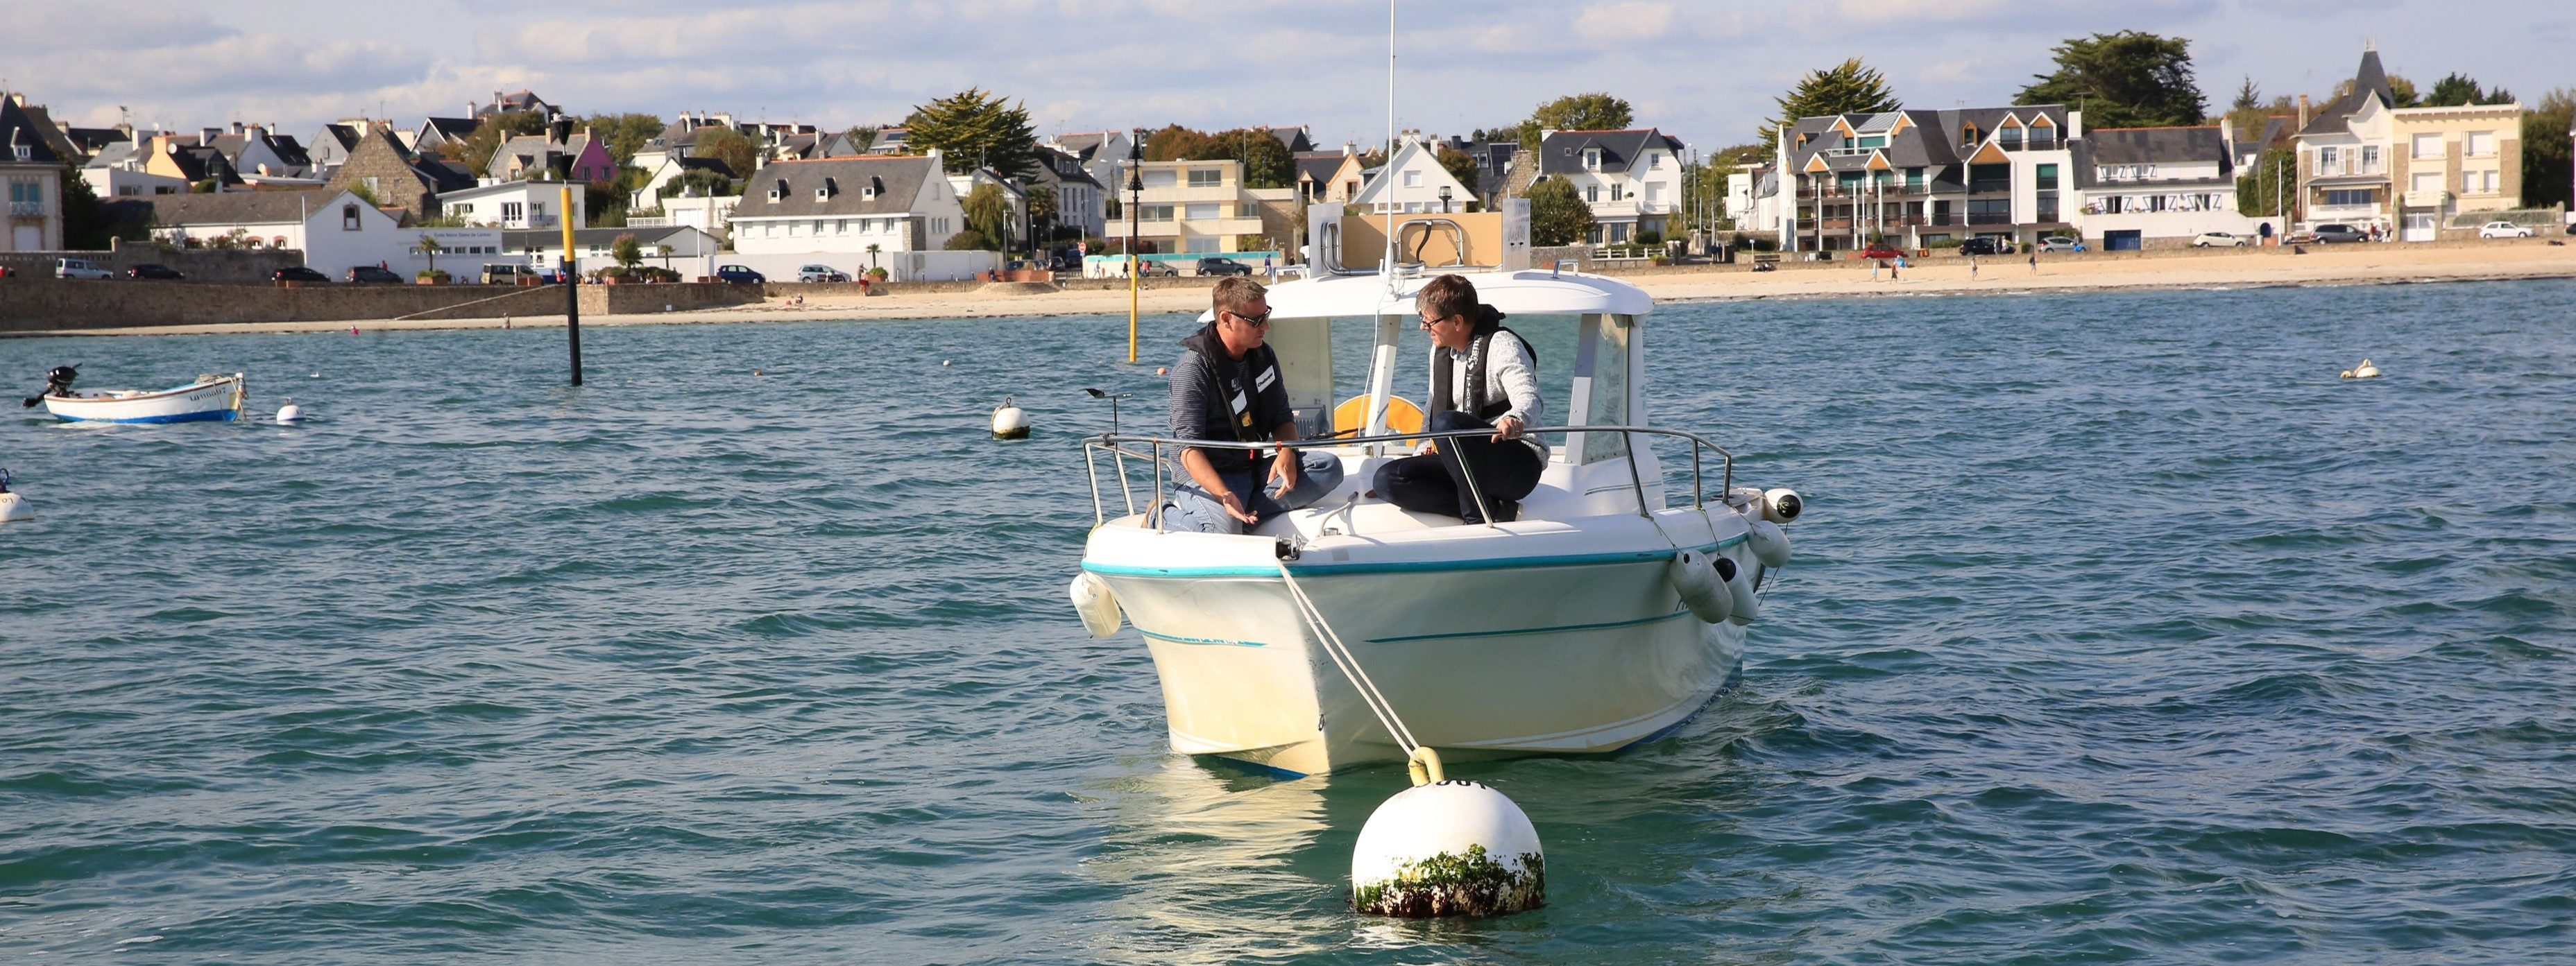 Où apprendre à naviguer ? Picksea - SAS Nauting